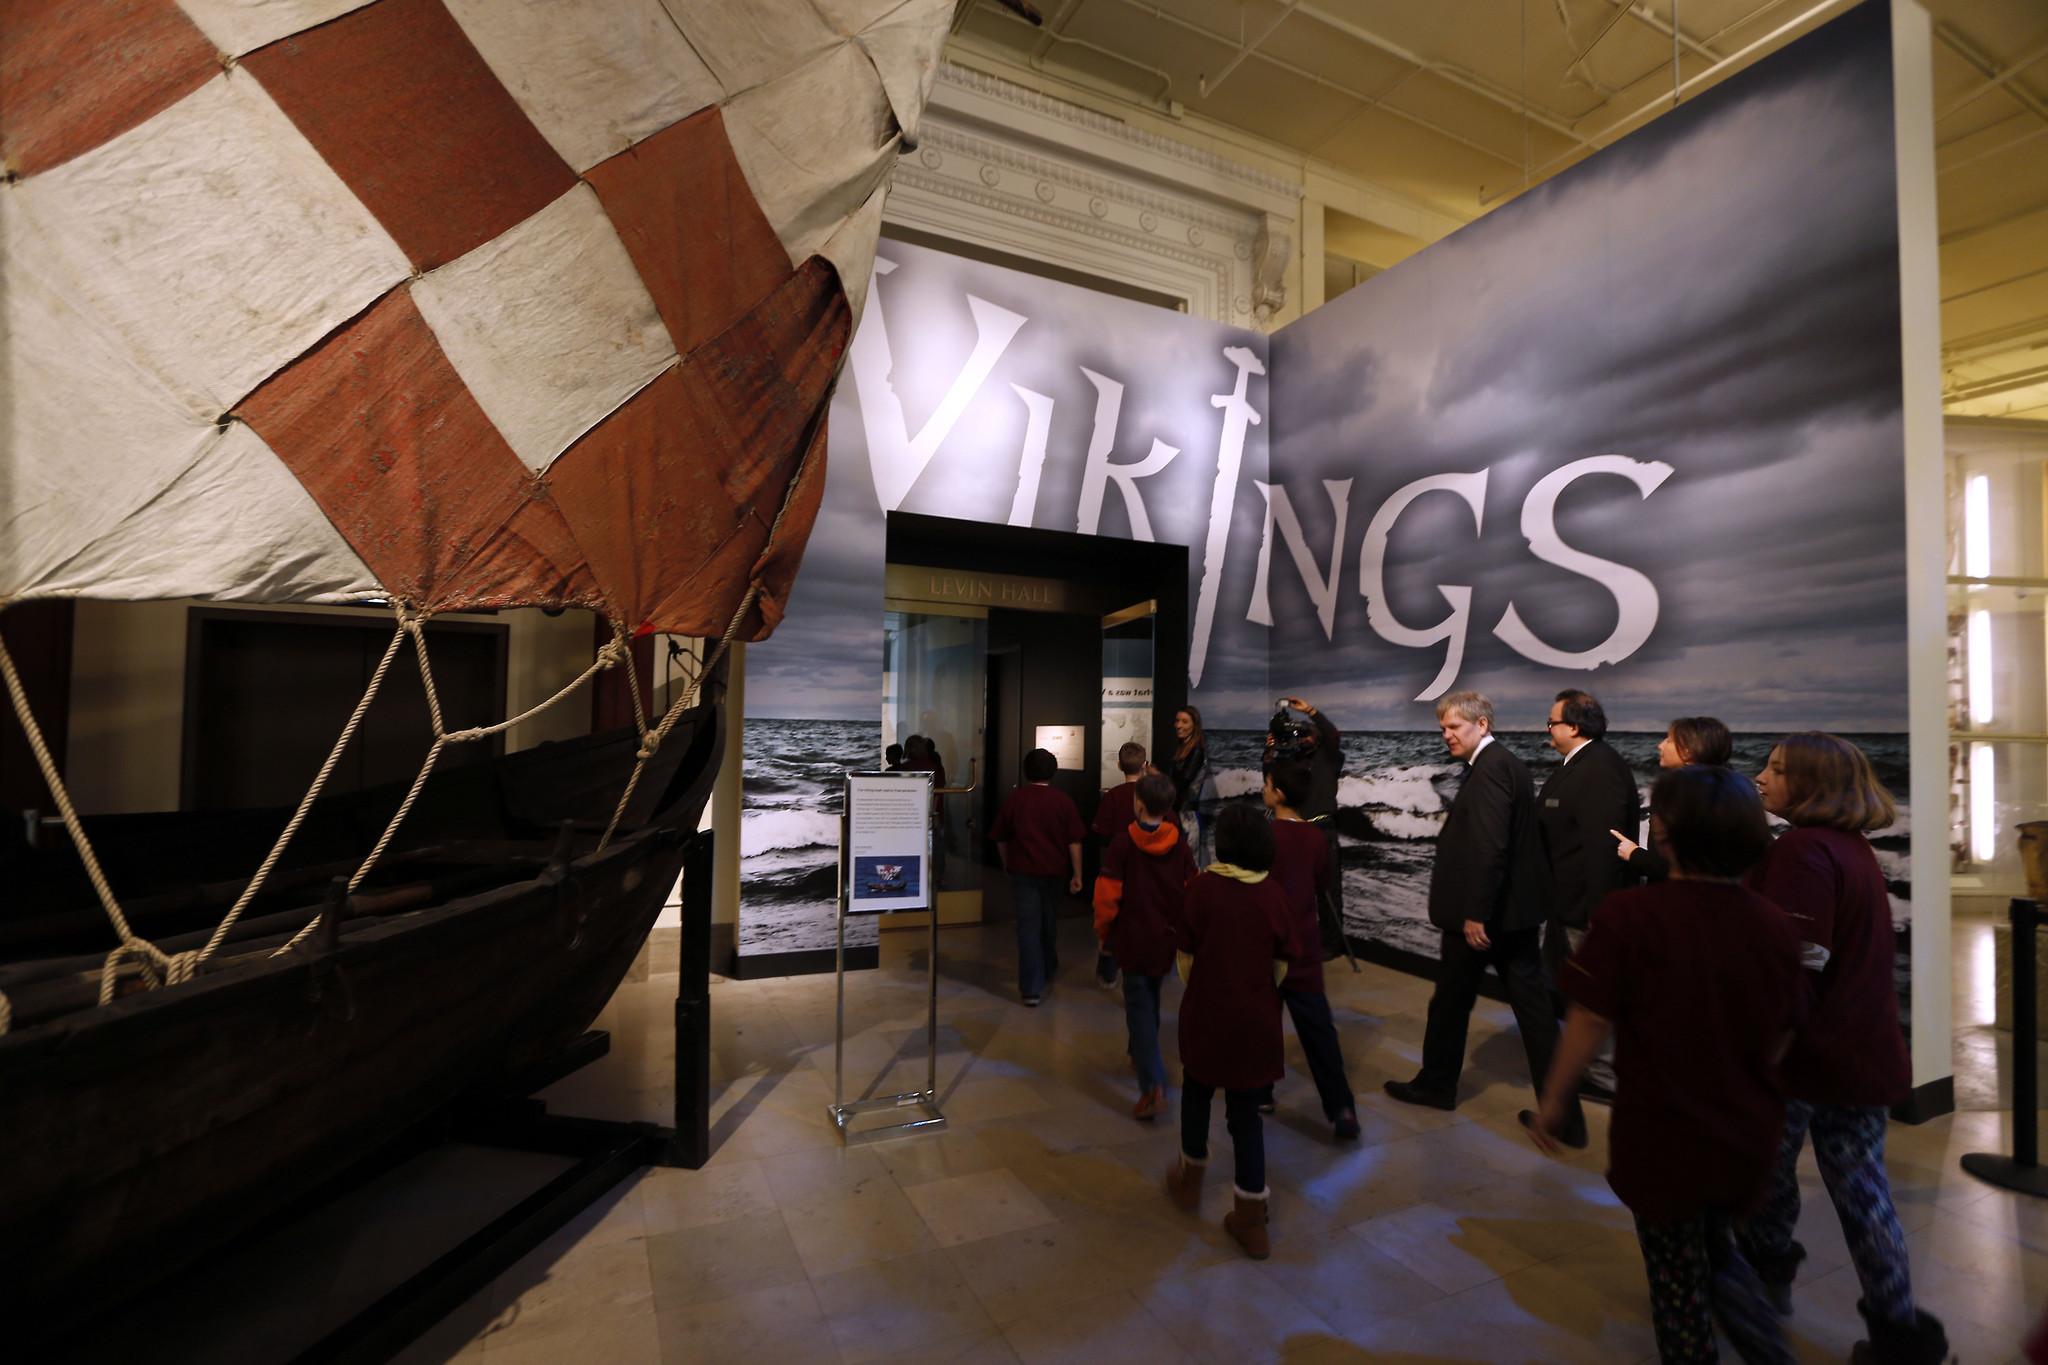 Vikings Exhibit At Field Museum Chicago Chicago Tribune - Scandinavian museums in us